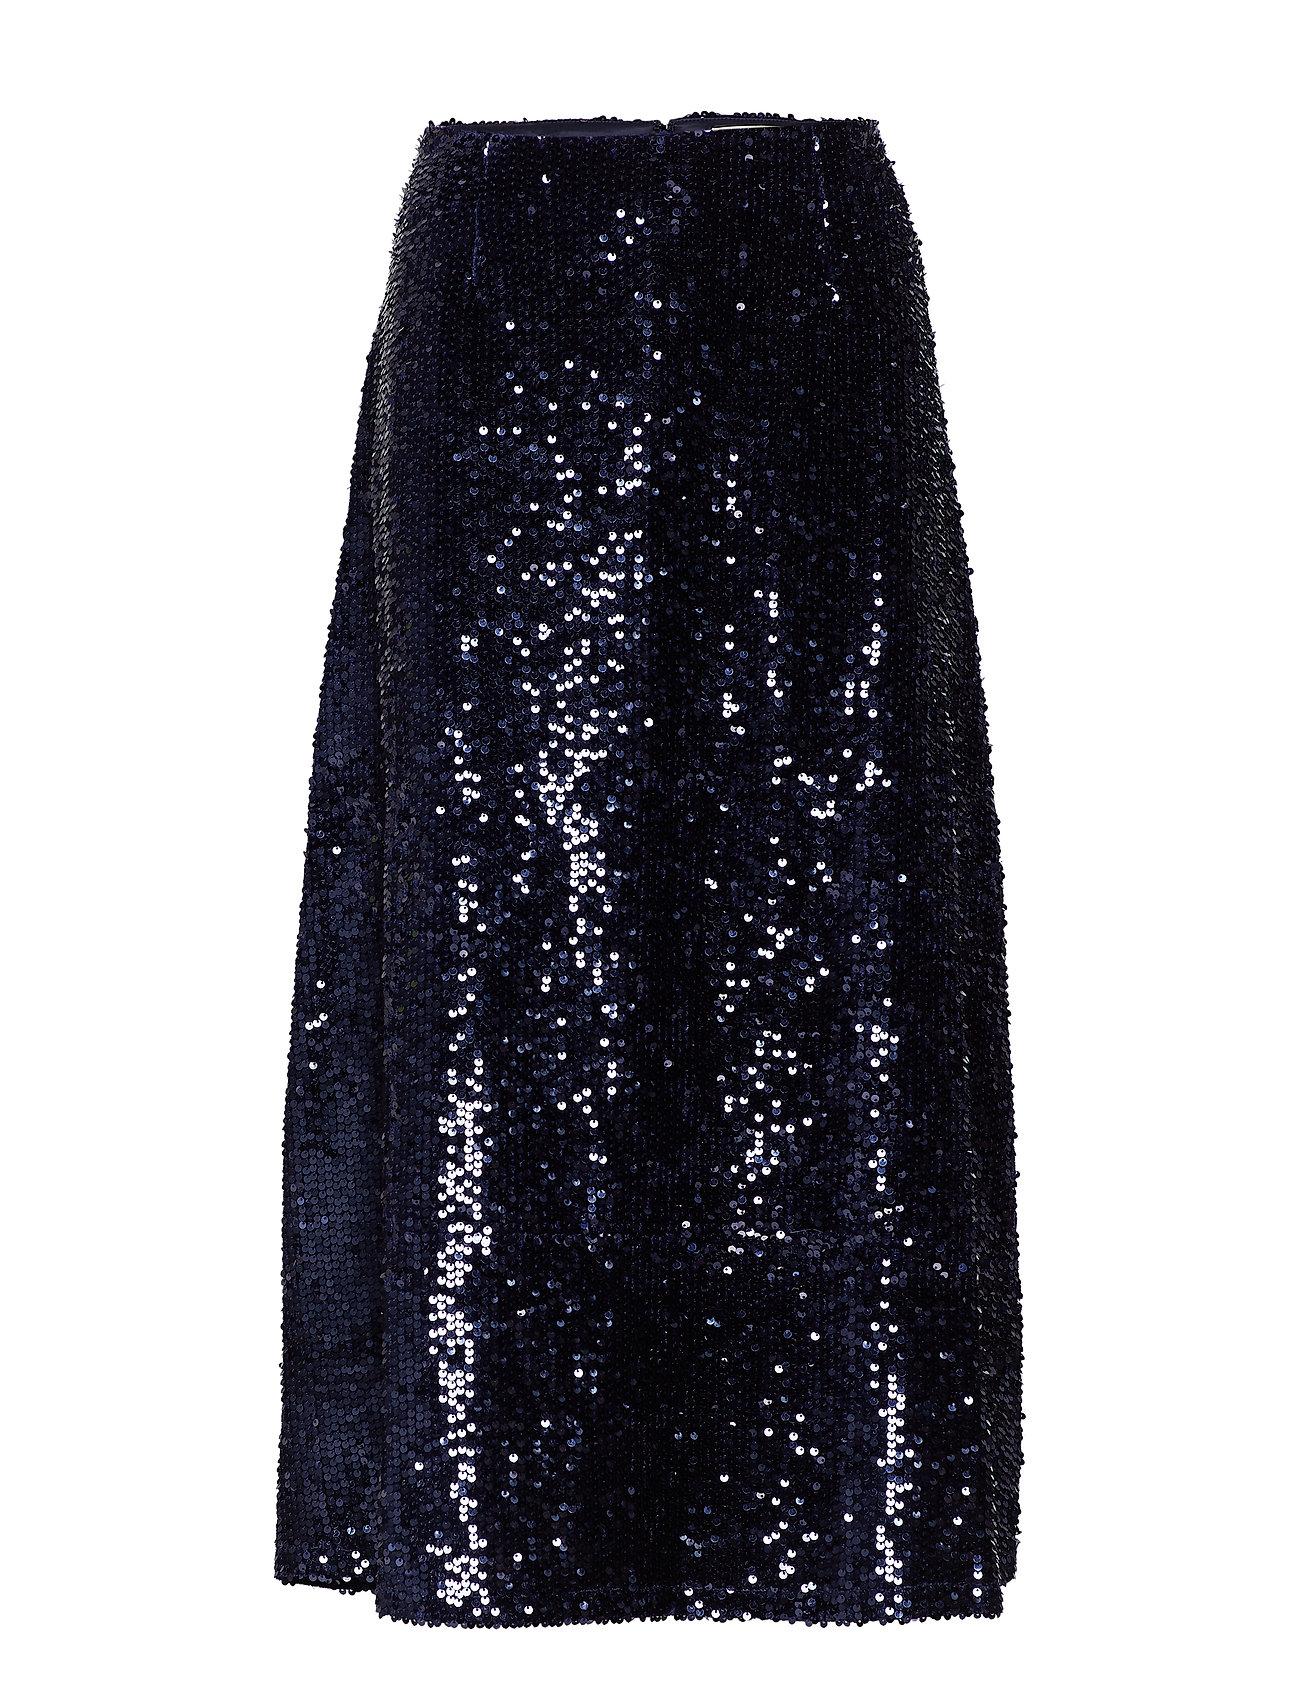 Image of Jones Skirt (3080431135)